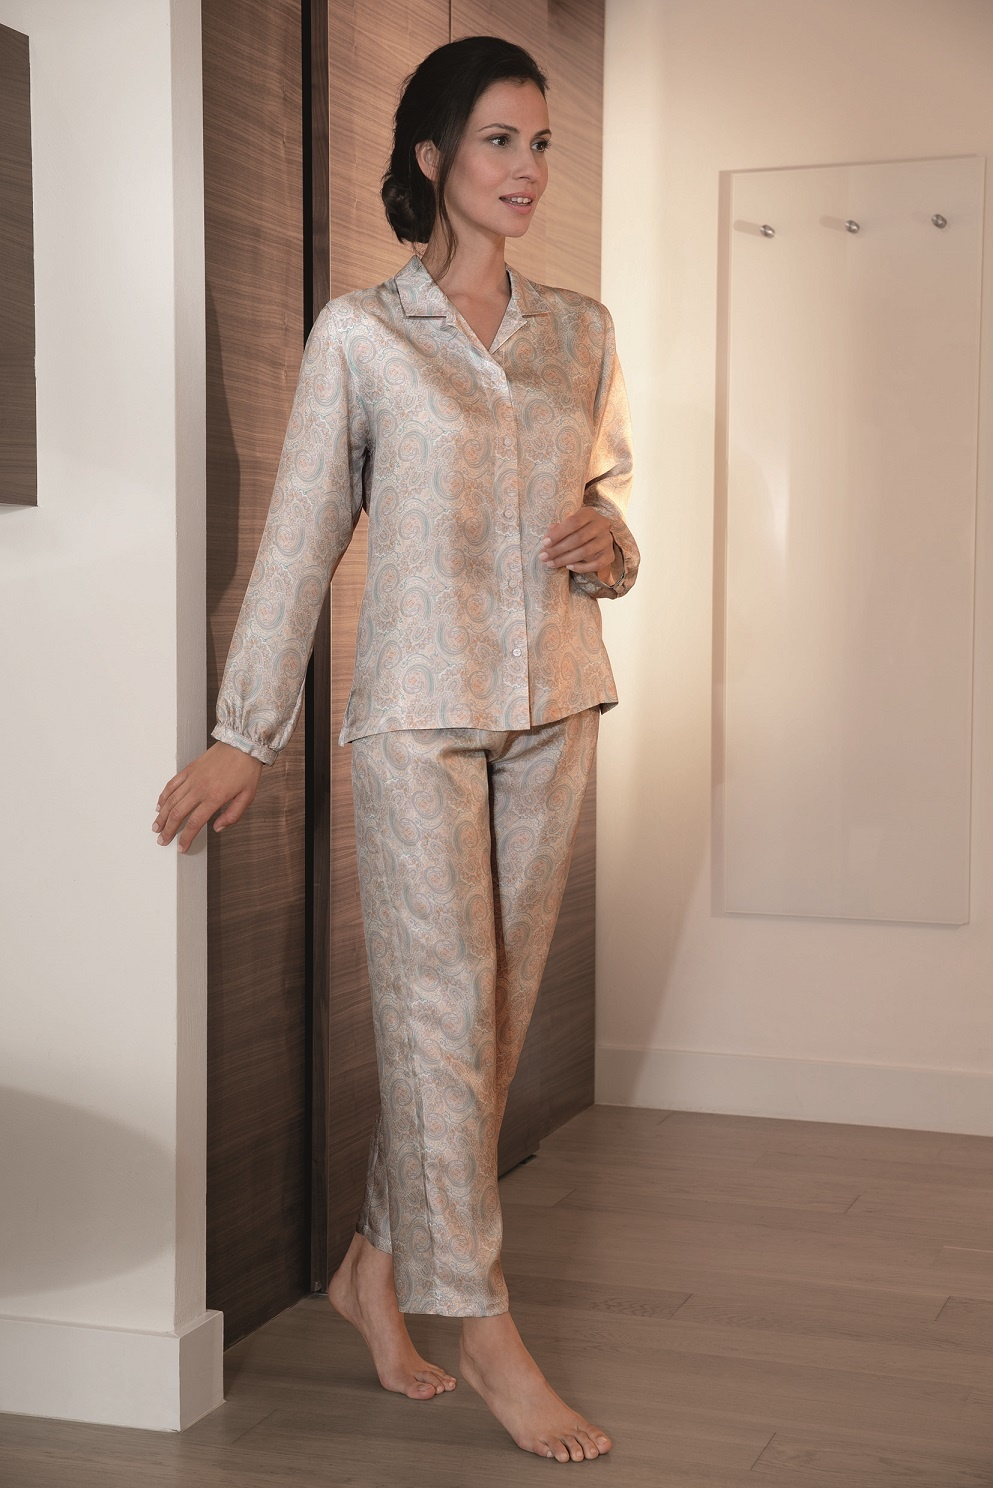 sale retailer c561f 82ea4 Damen Schlafanzug Seide Novila Pyjama 100% Seide Damen Textile Träume